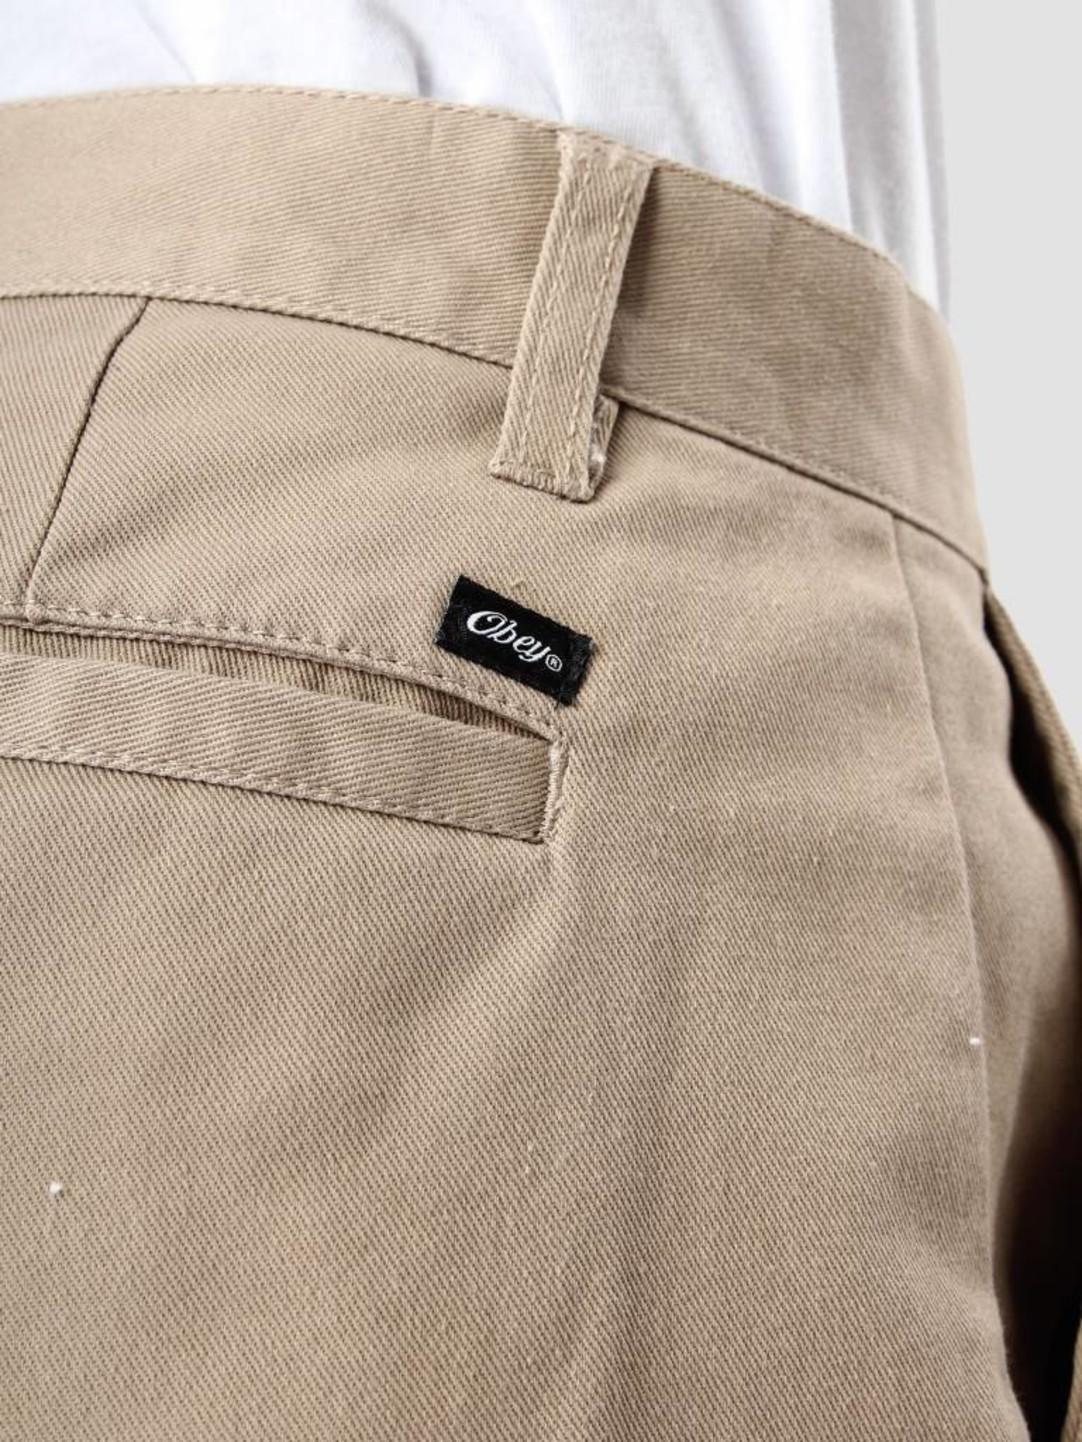 Obey Obey Straggler Flodded Pant Khaki 142020060-Kha